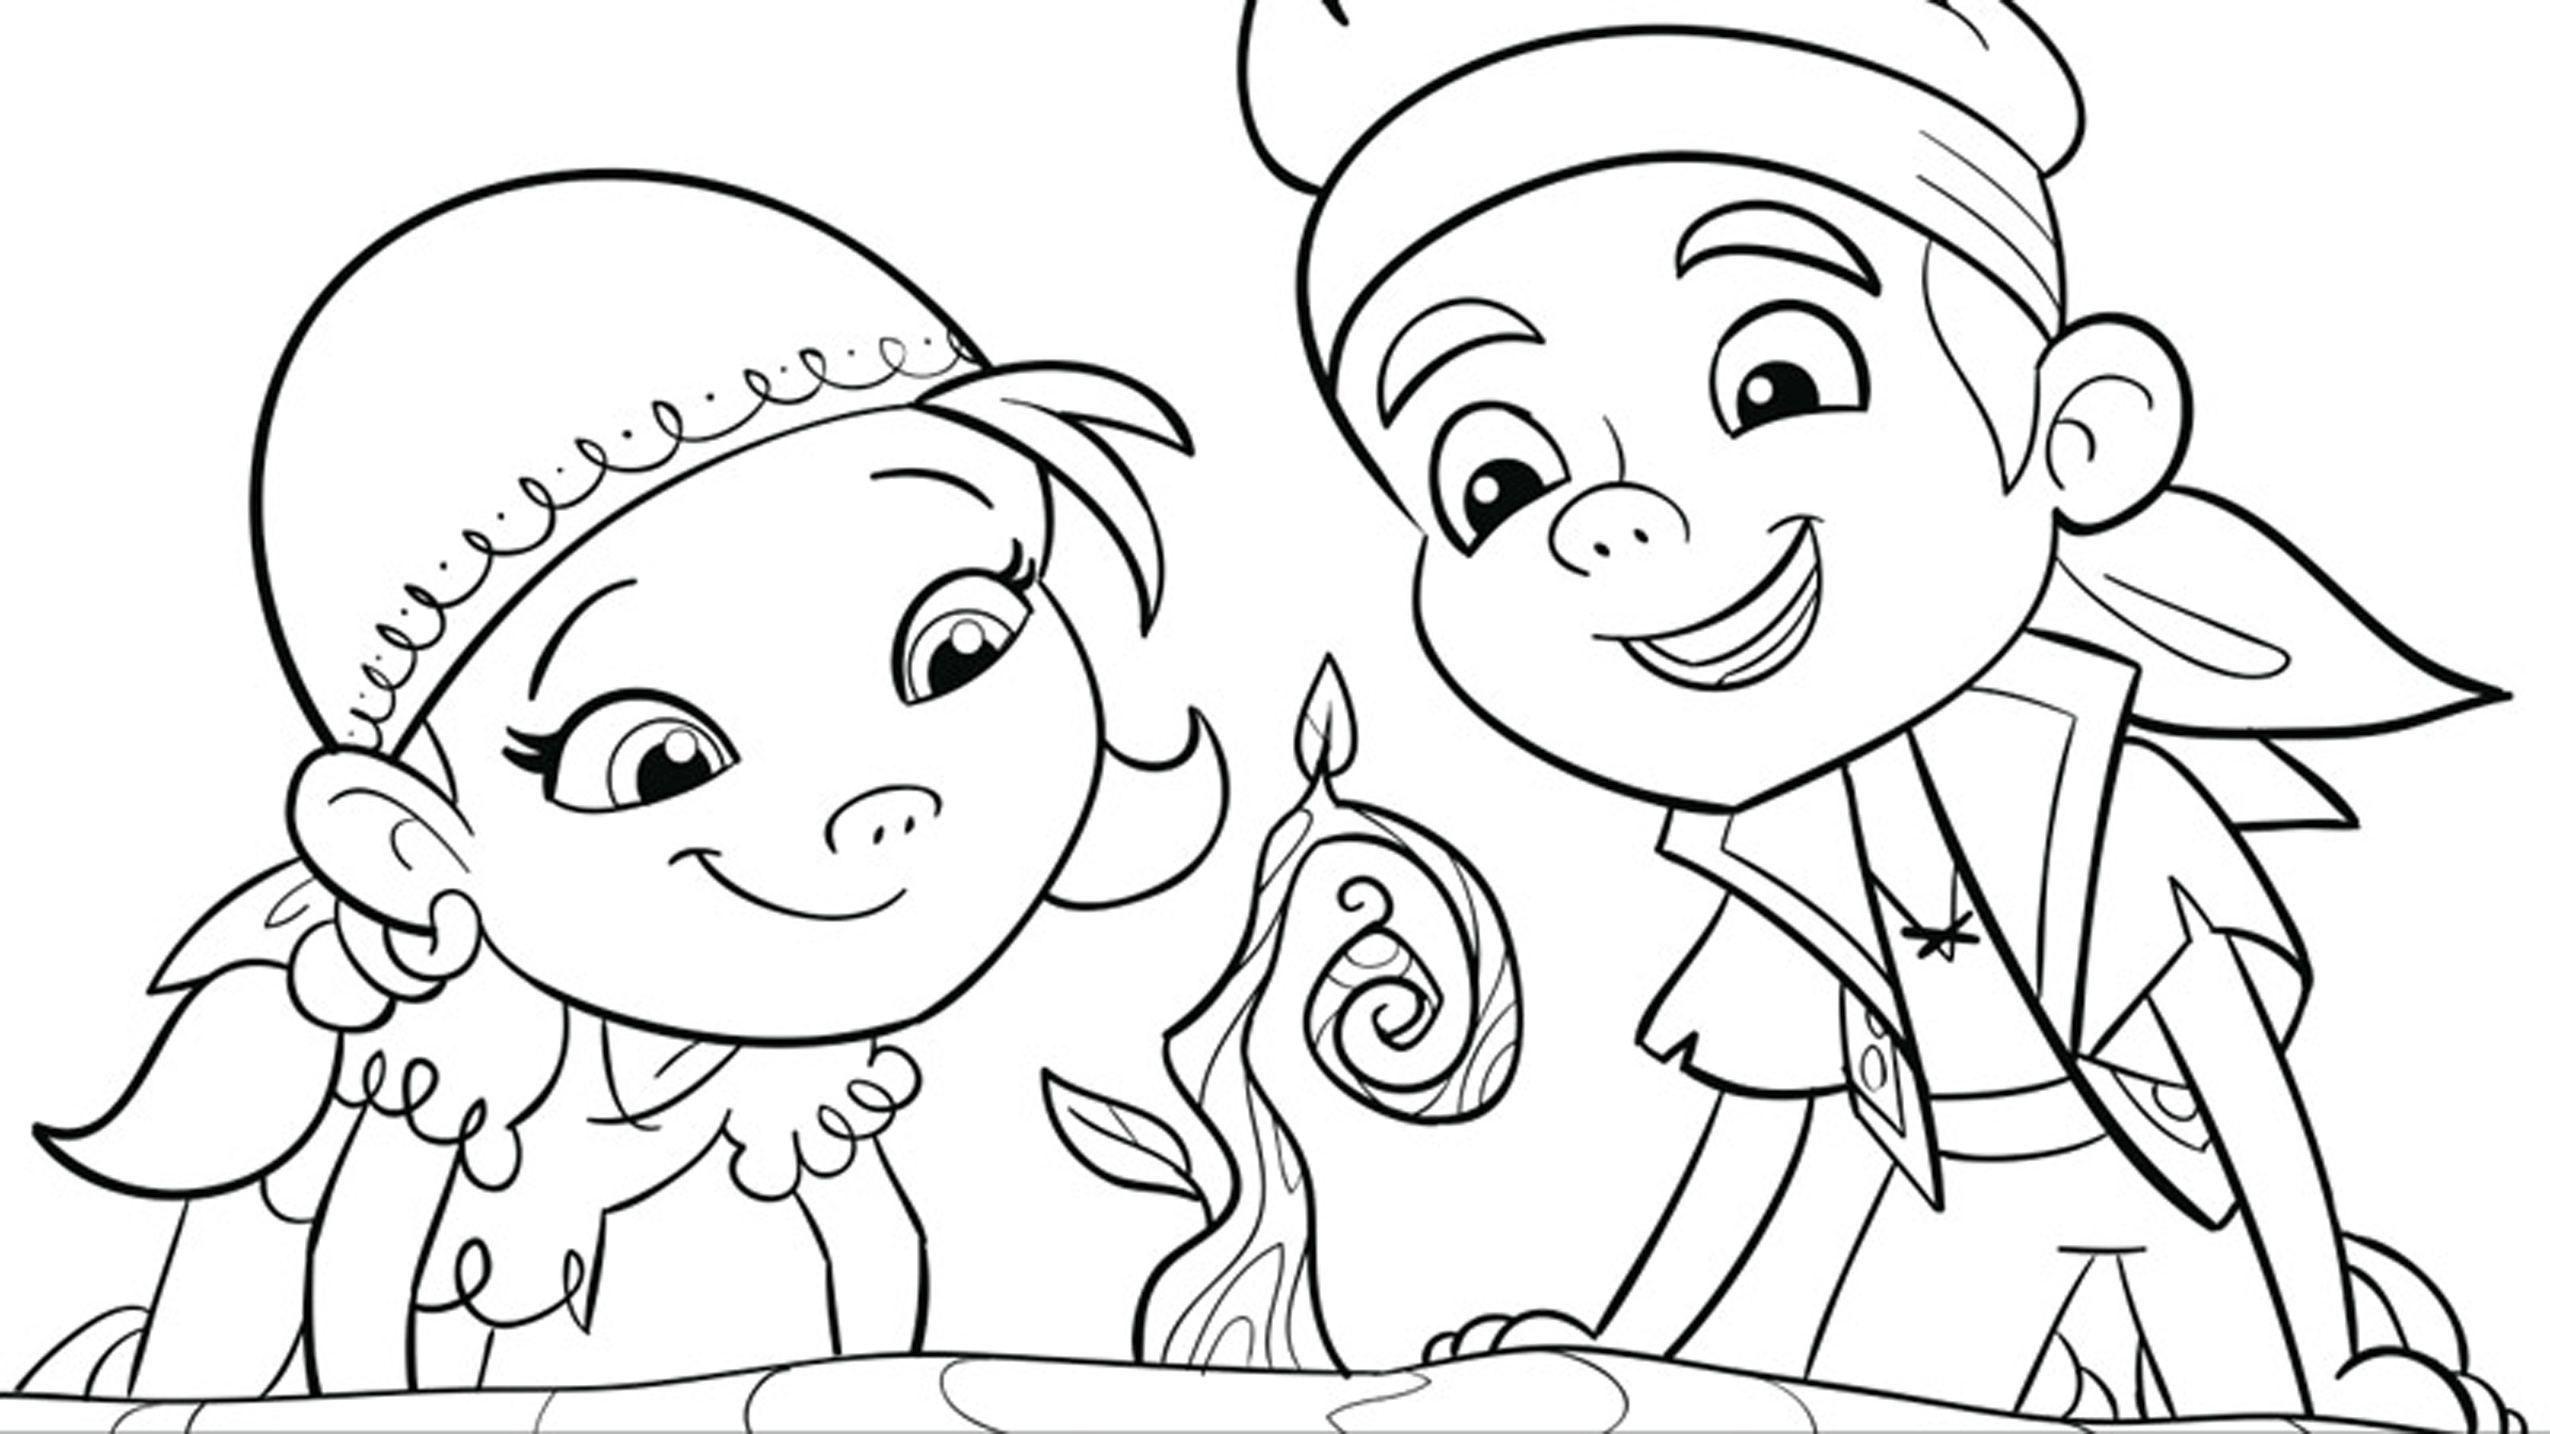 51 Printable Disney Coloring Pages Pdf in 2020 Disney